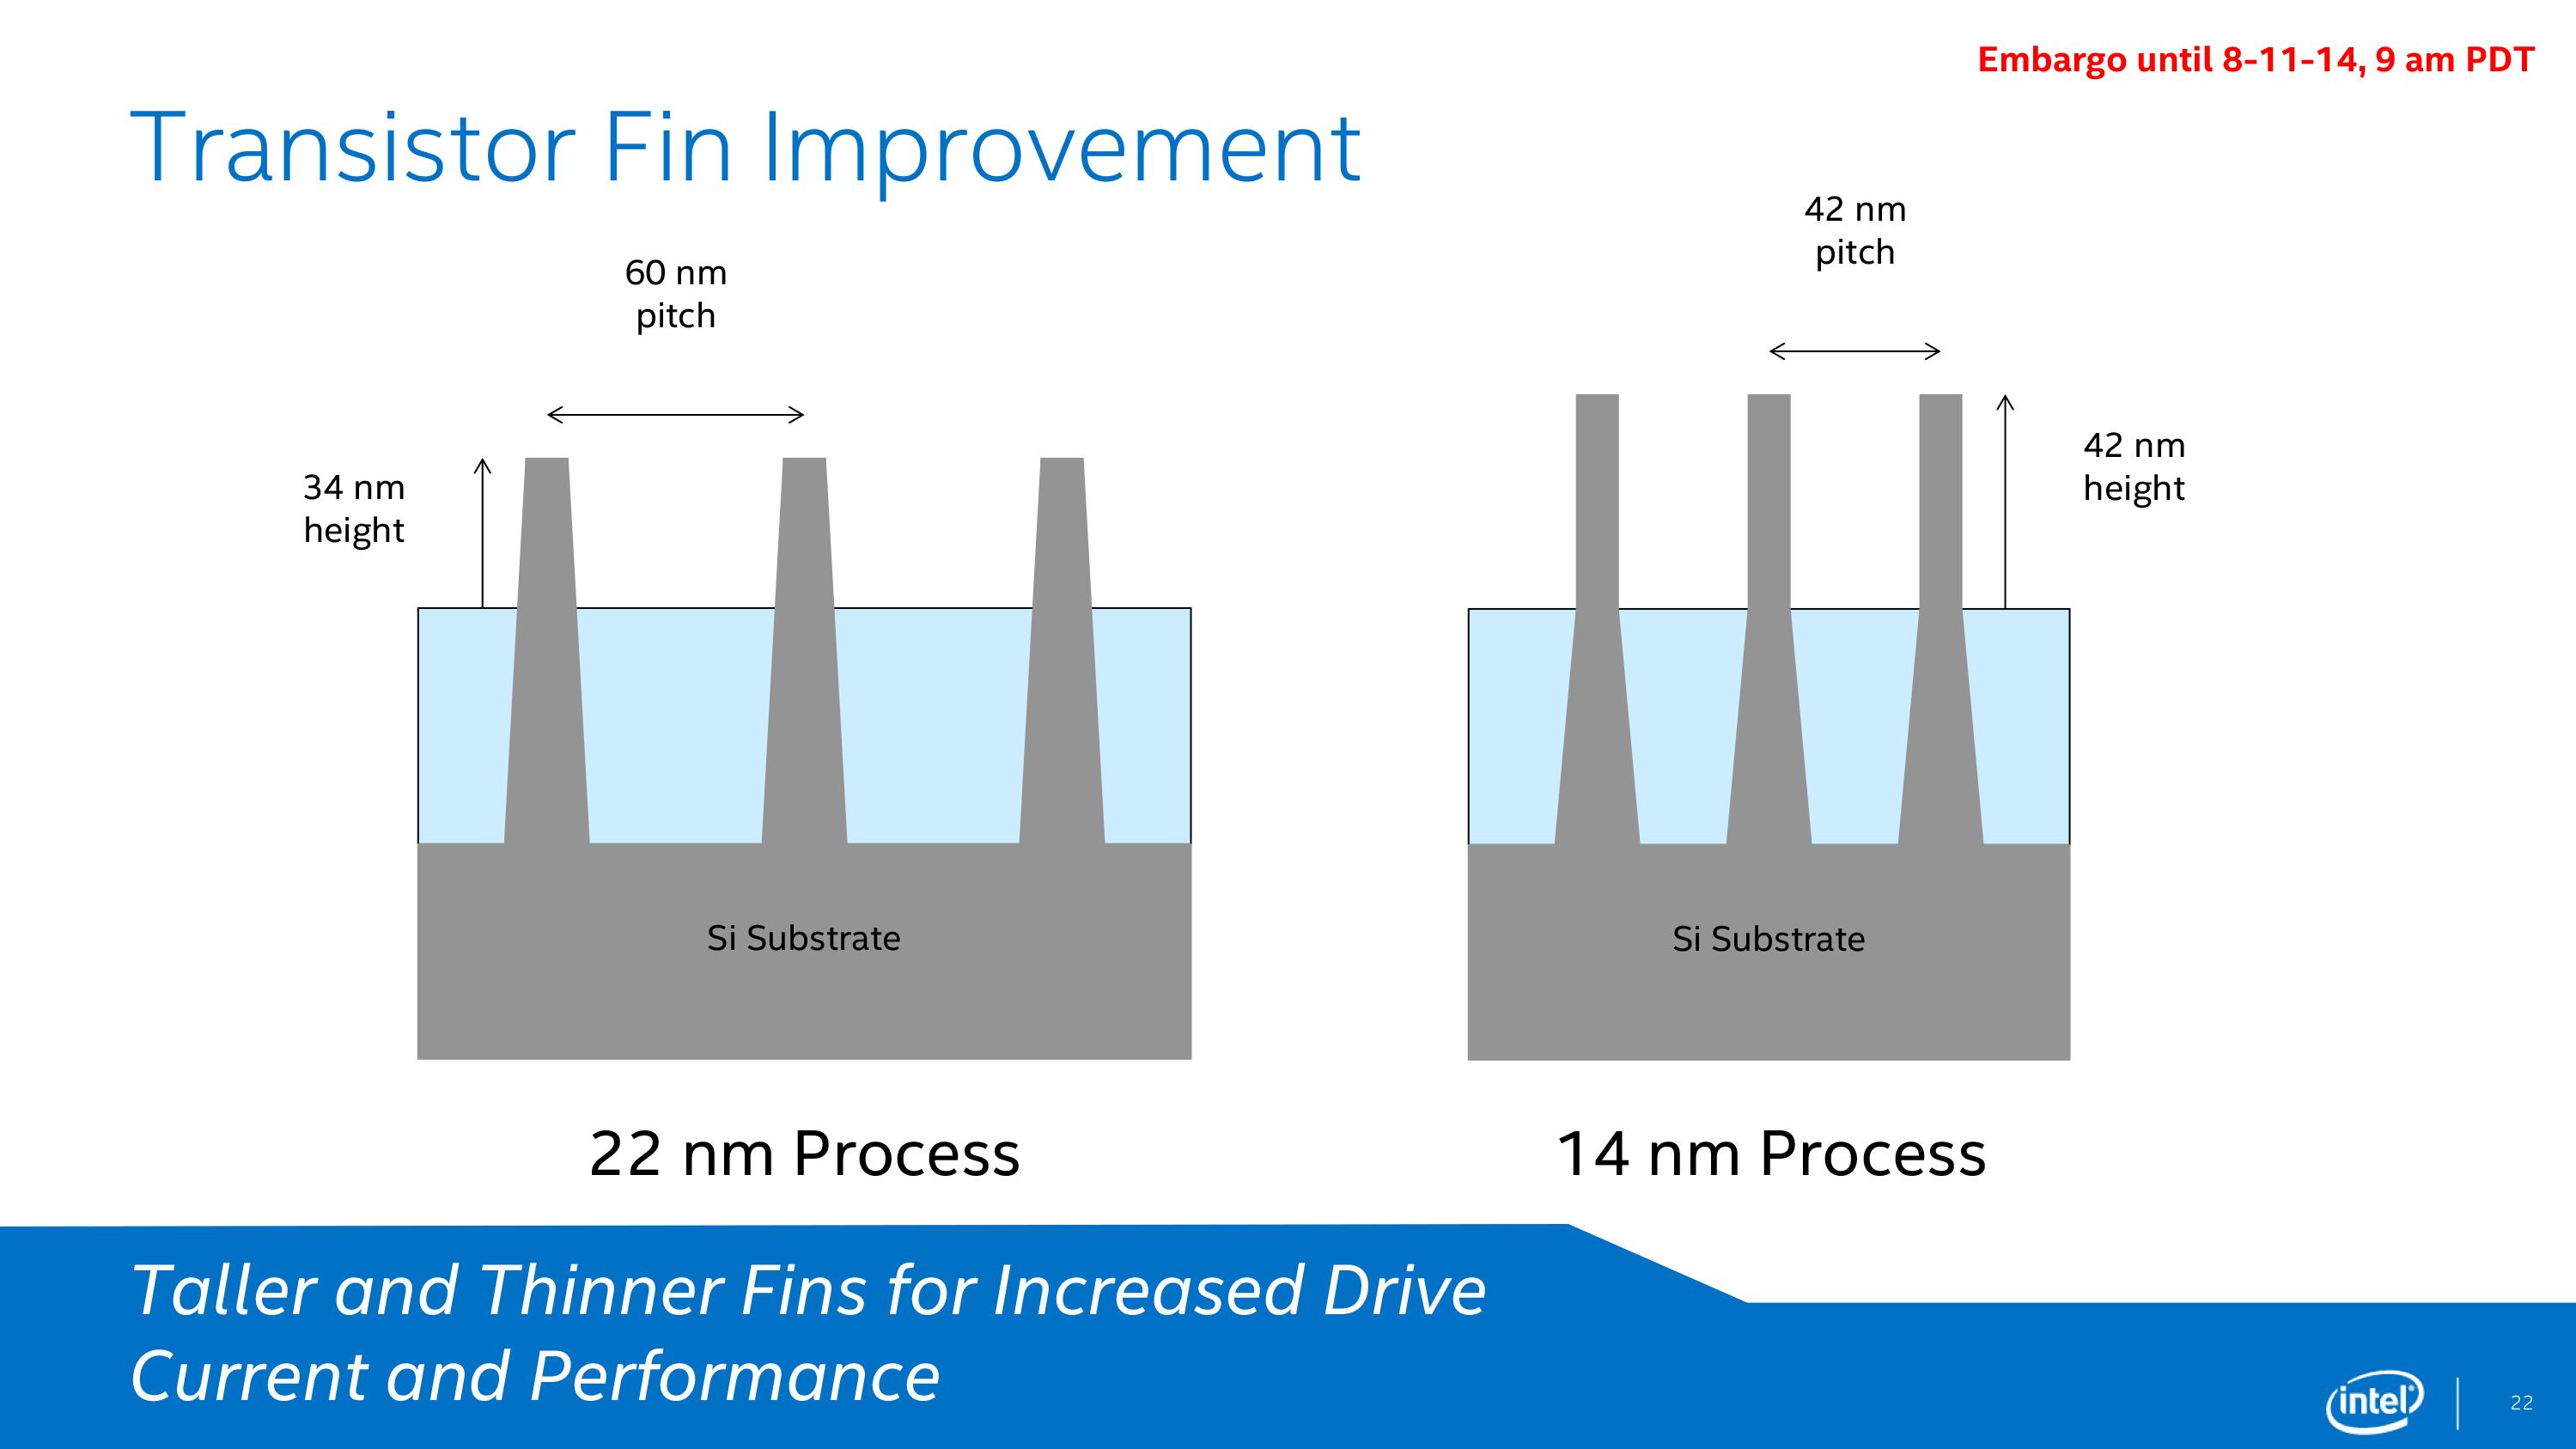 Updated 14nm, Speed Shift V2, Performance Updates Intel